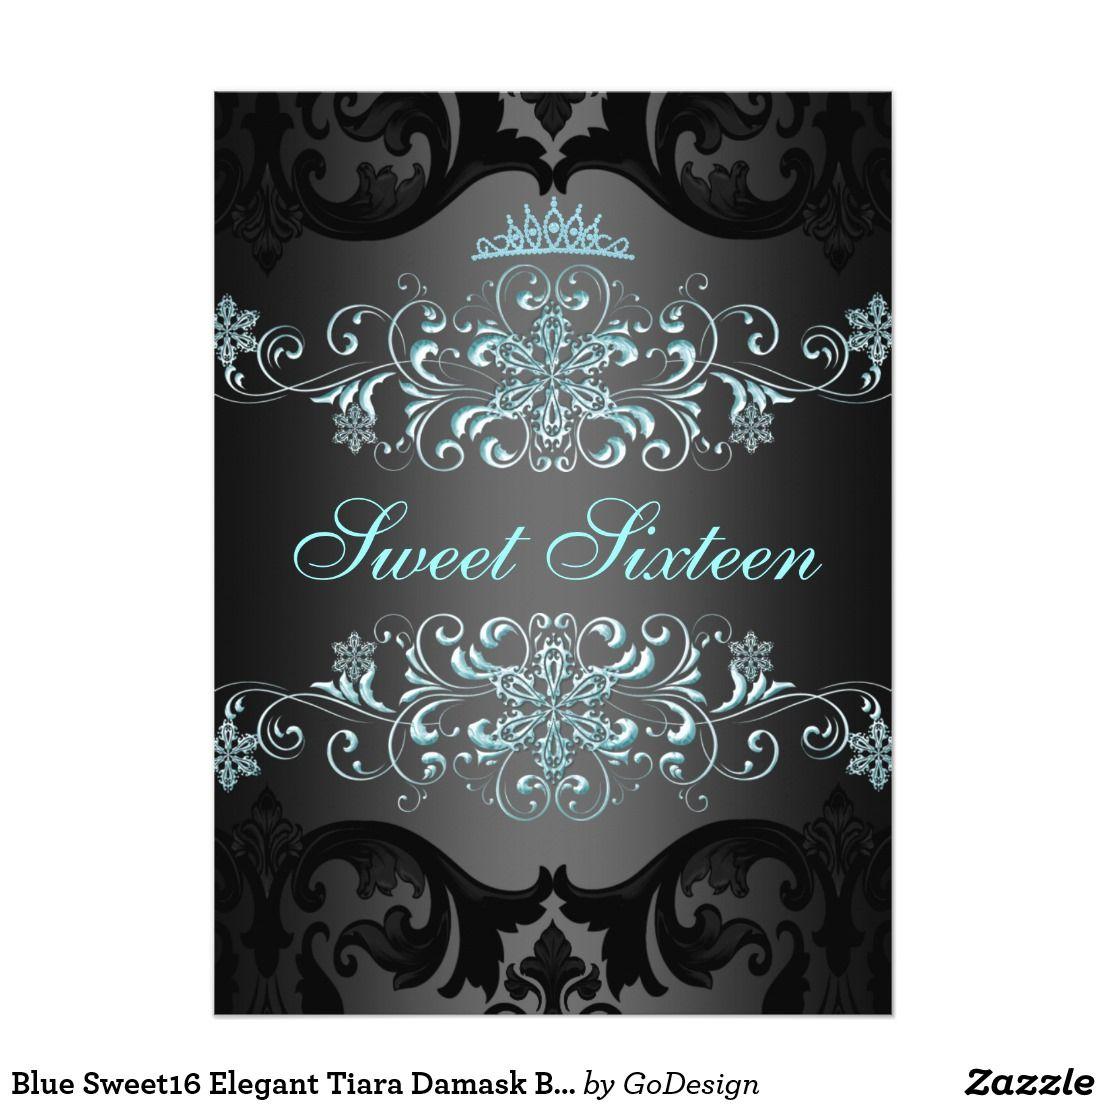 Blue Sweet16 Elegant Tiara Damask Birthday Invite | Party ...